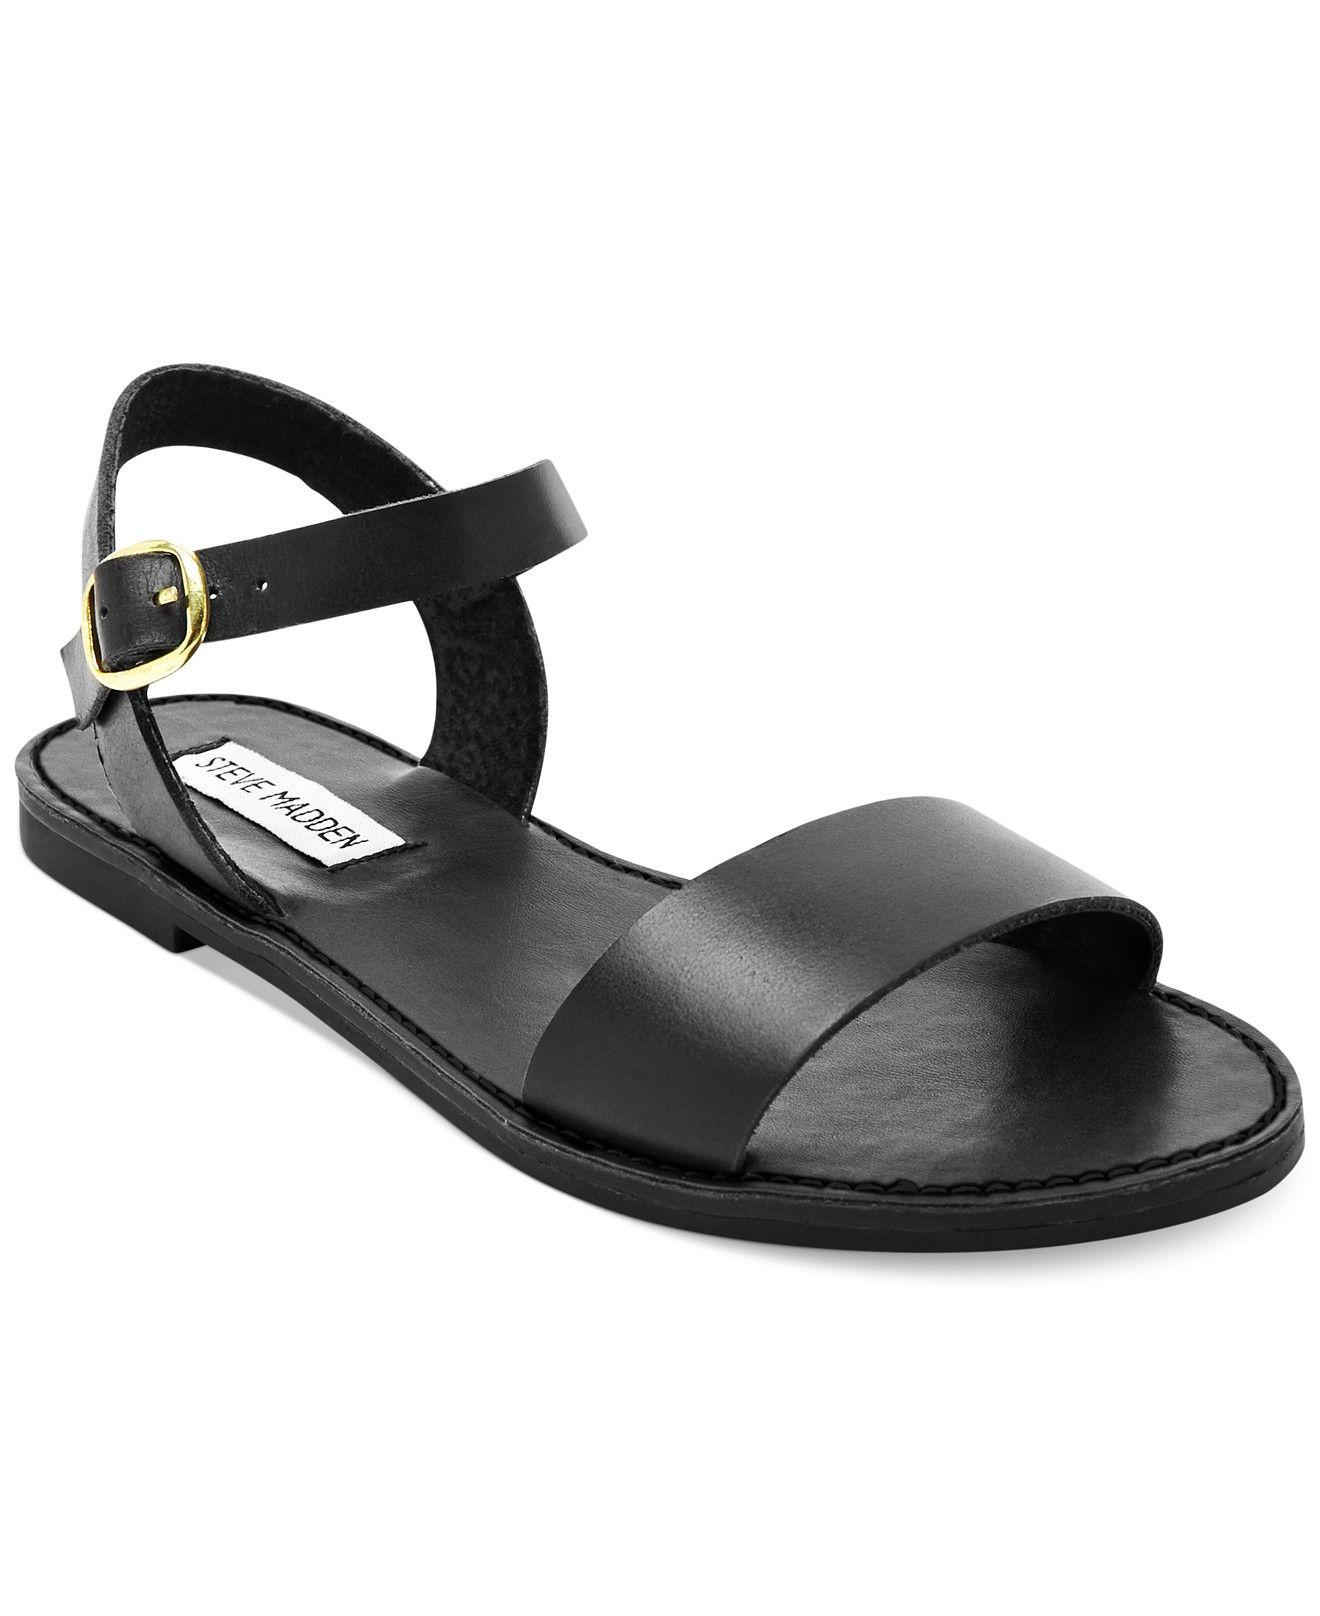 4e267f86067 Donddi Flat Sandals | Fashion | Sandals, Shoes sandals, Black sandals